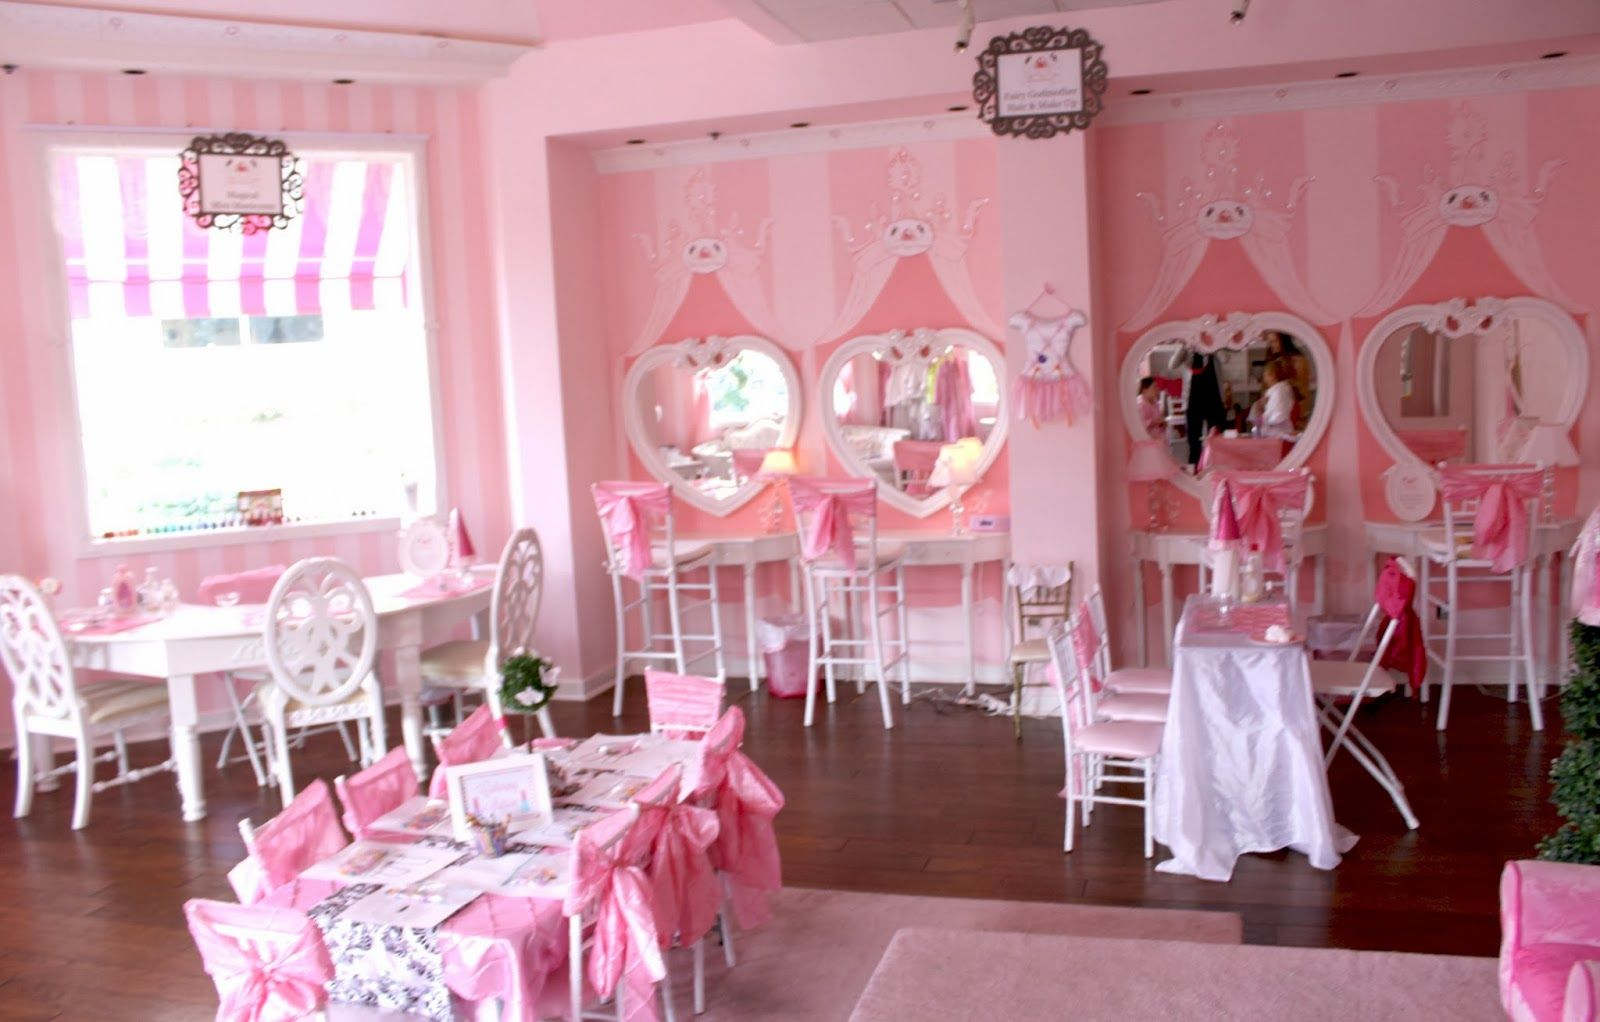 The Larson Lingo Kate S Nail Salon Birthday Party Sugar